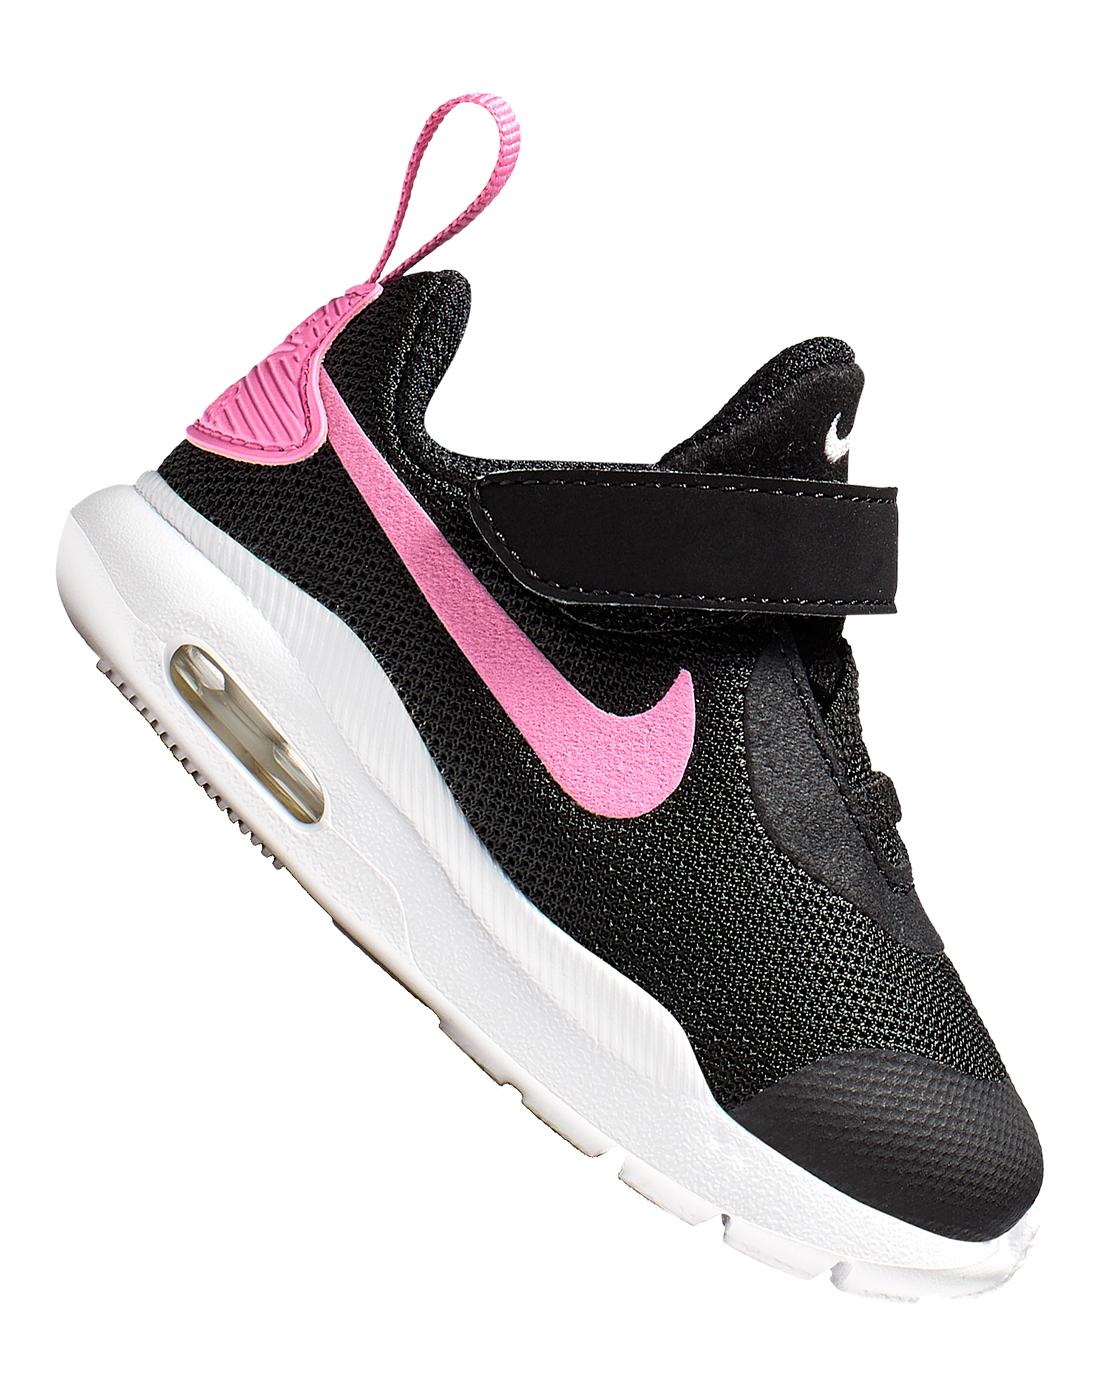 0a31670dab54 Nike Infant Girls Air Max Oketo